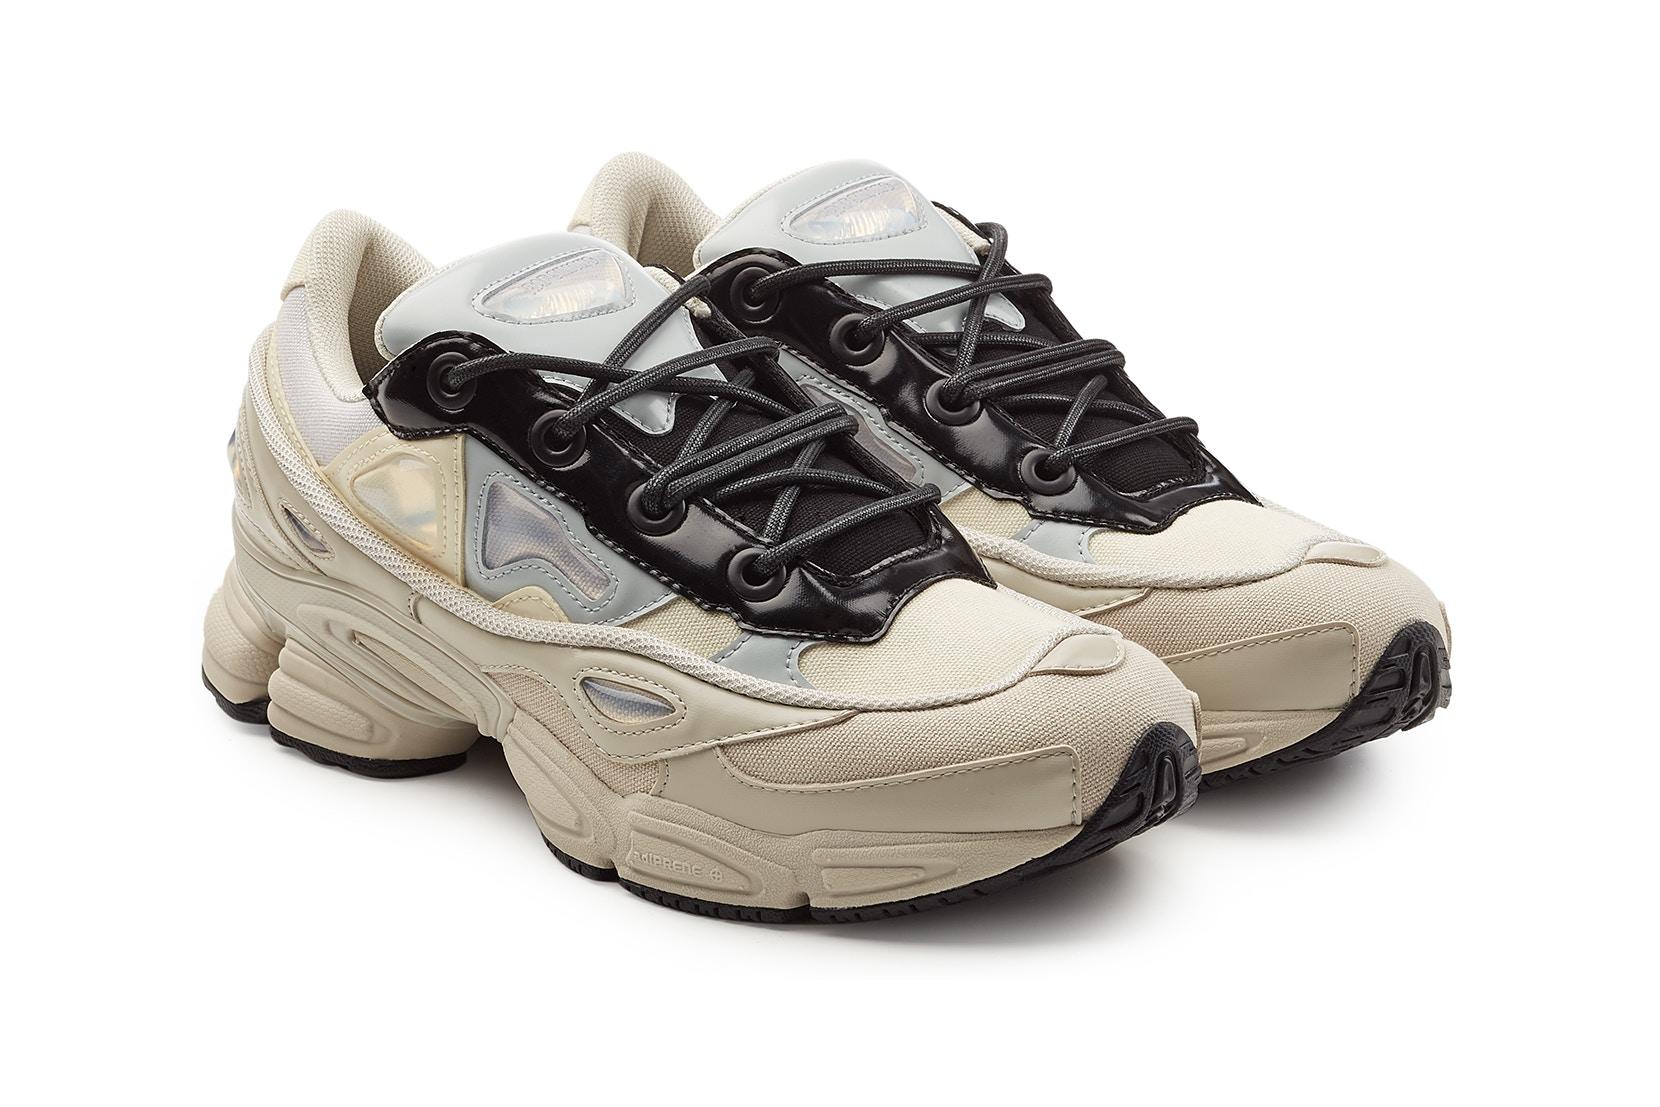 adidas by Raf Simons 5